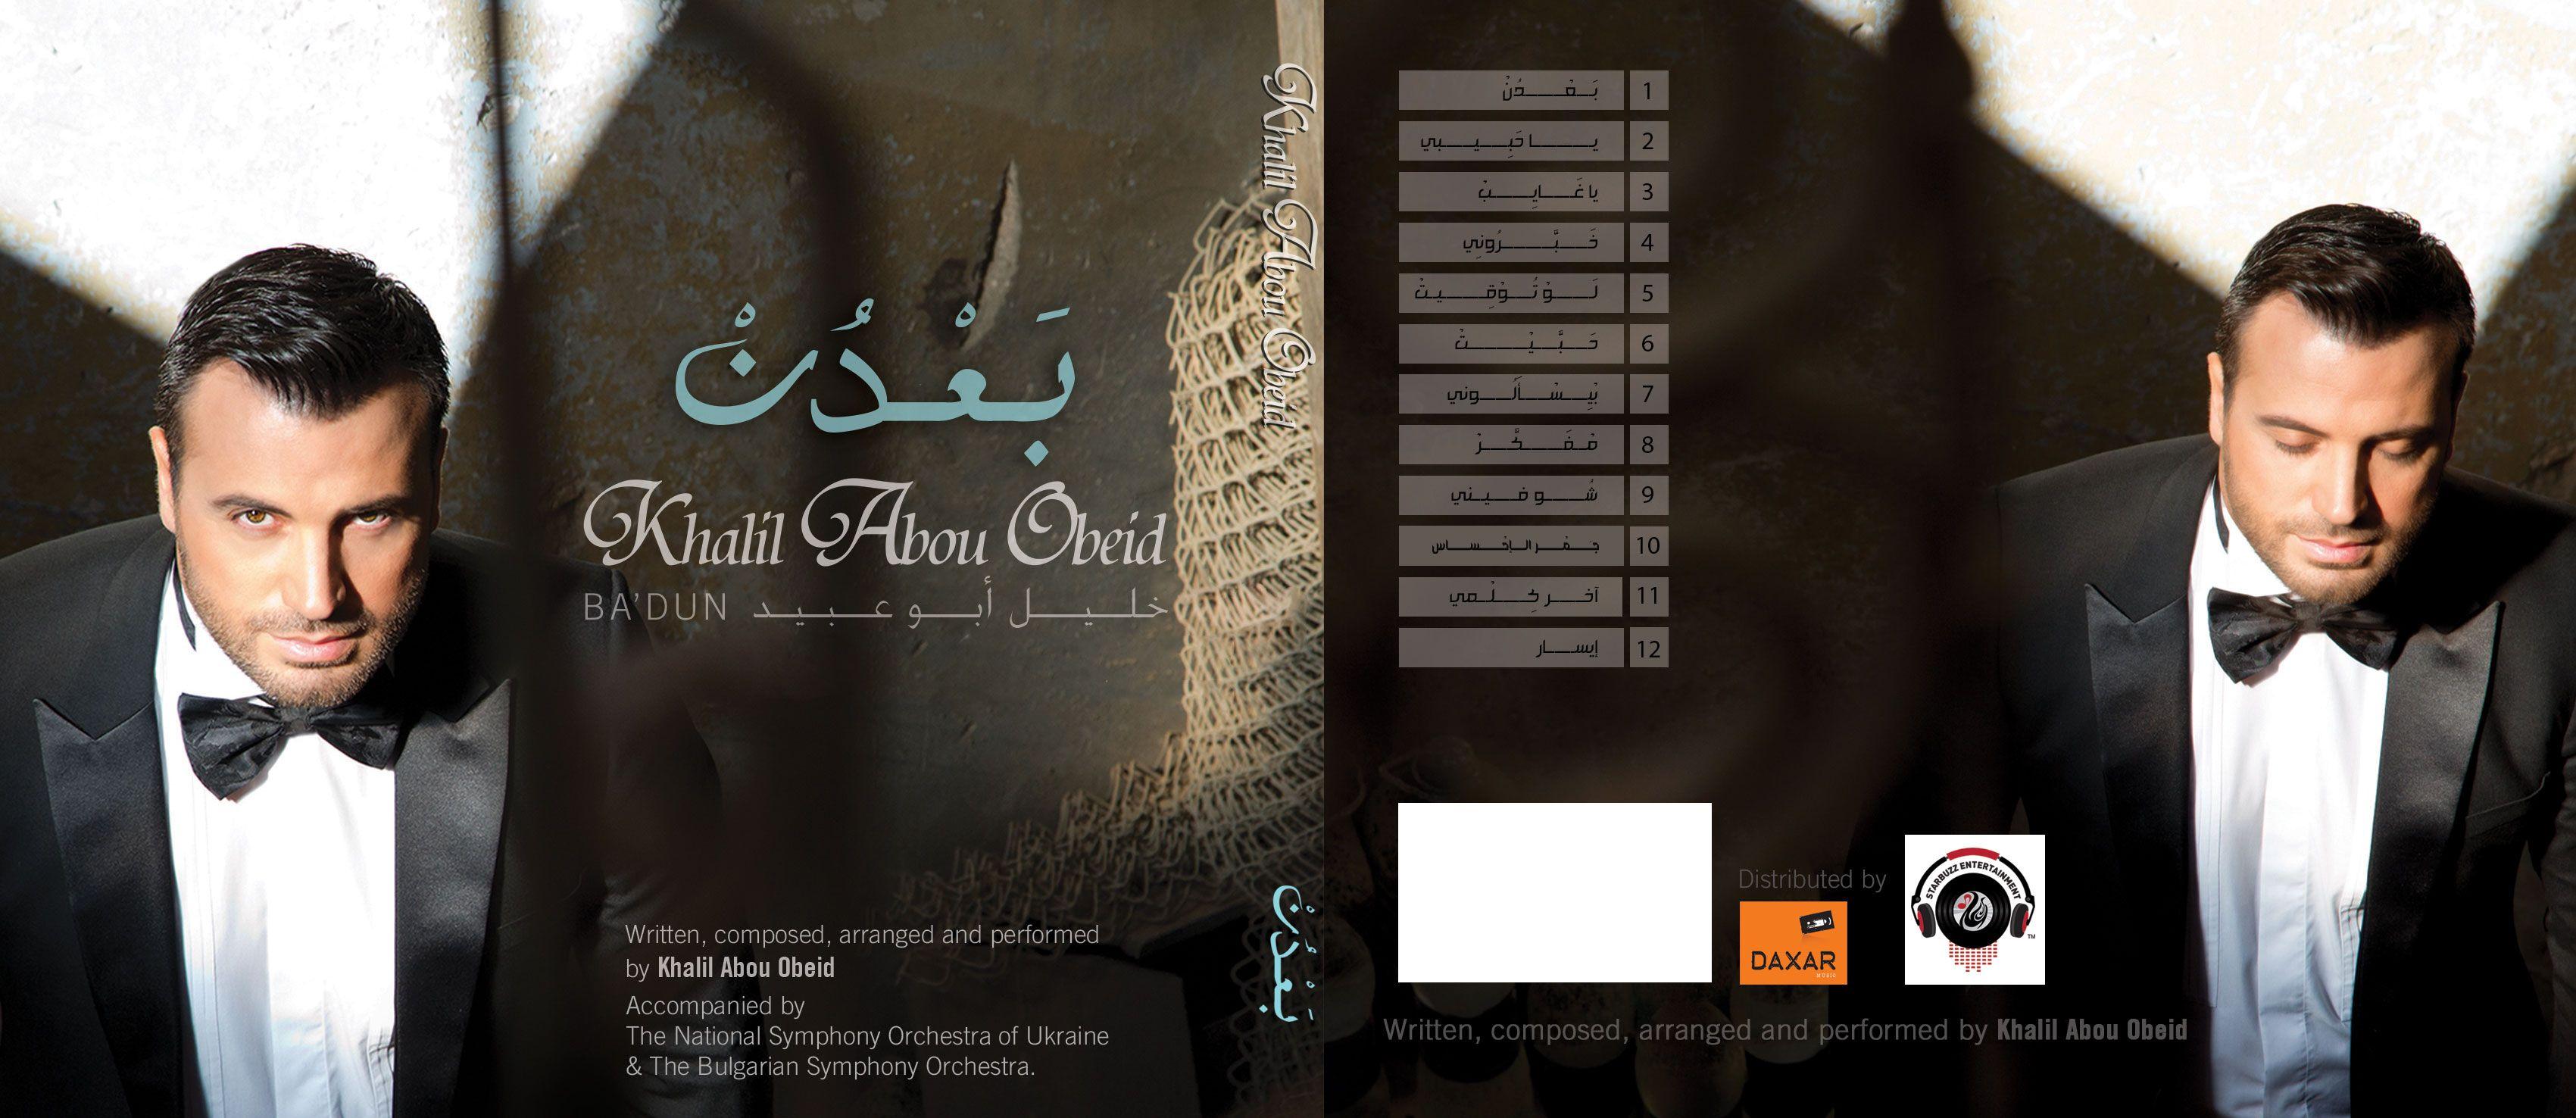 Album Cover For Khalil Abou Obeid #khalil #ba3dun #music #art